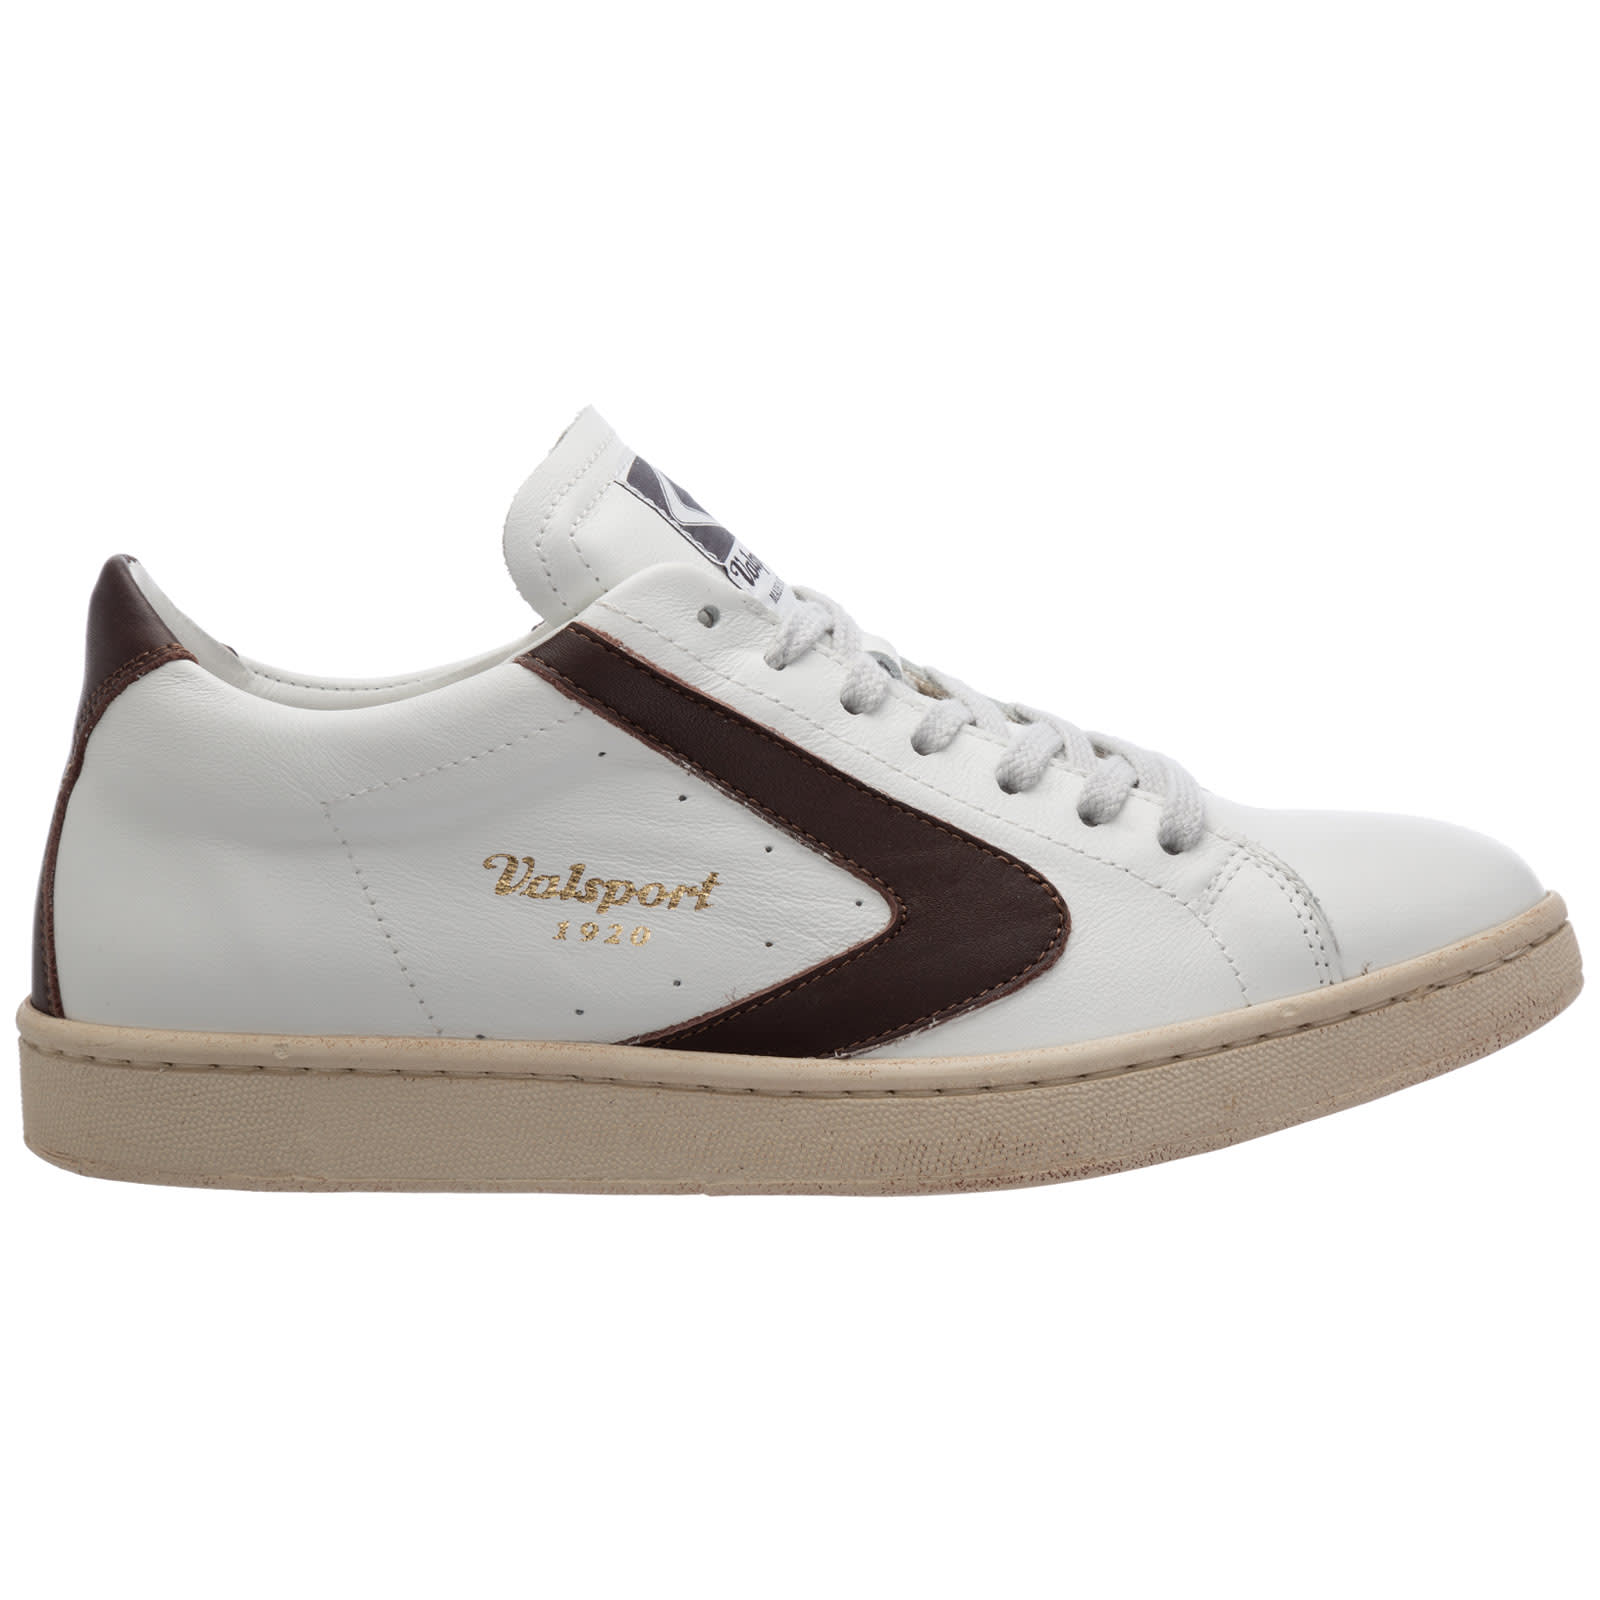 Valsport 1920 Tournament Sneakers